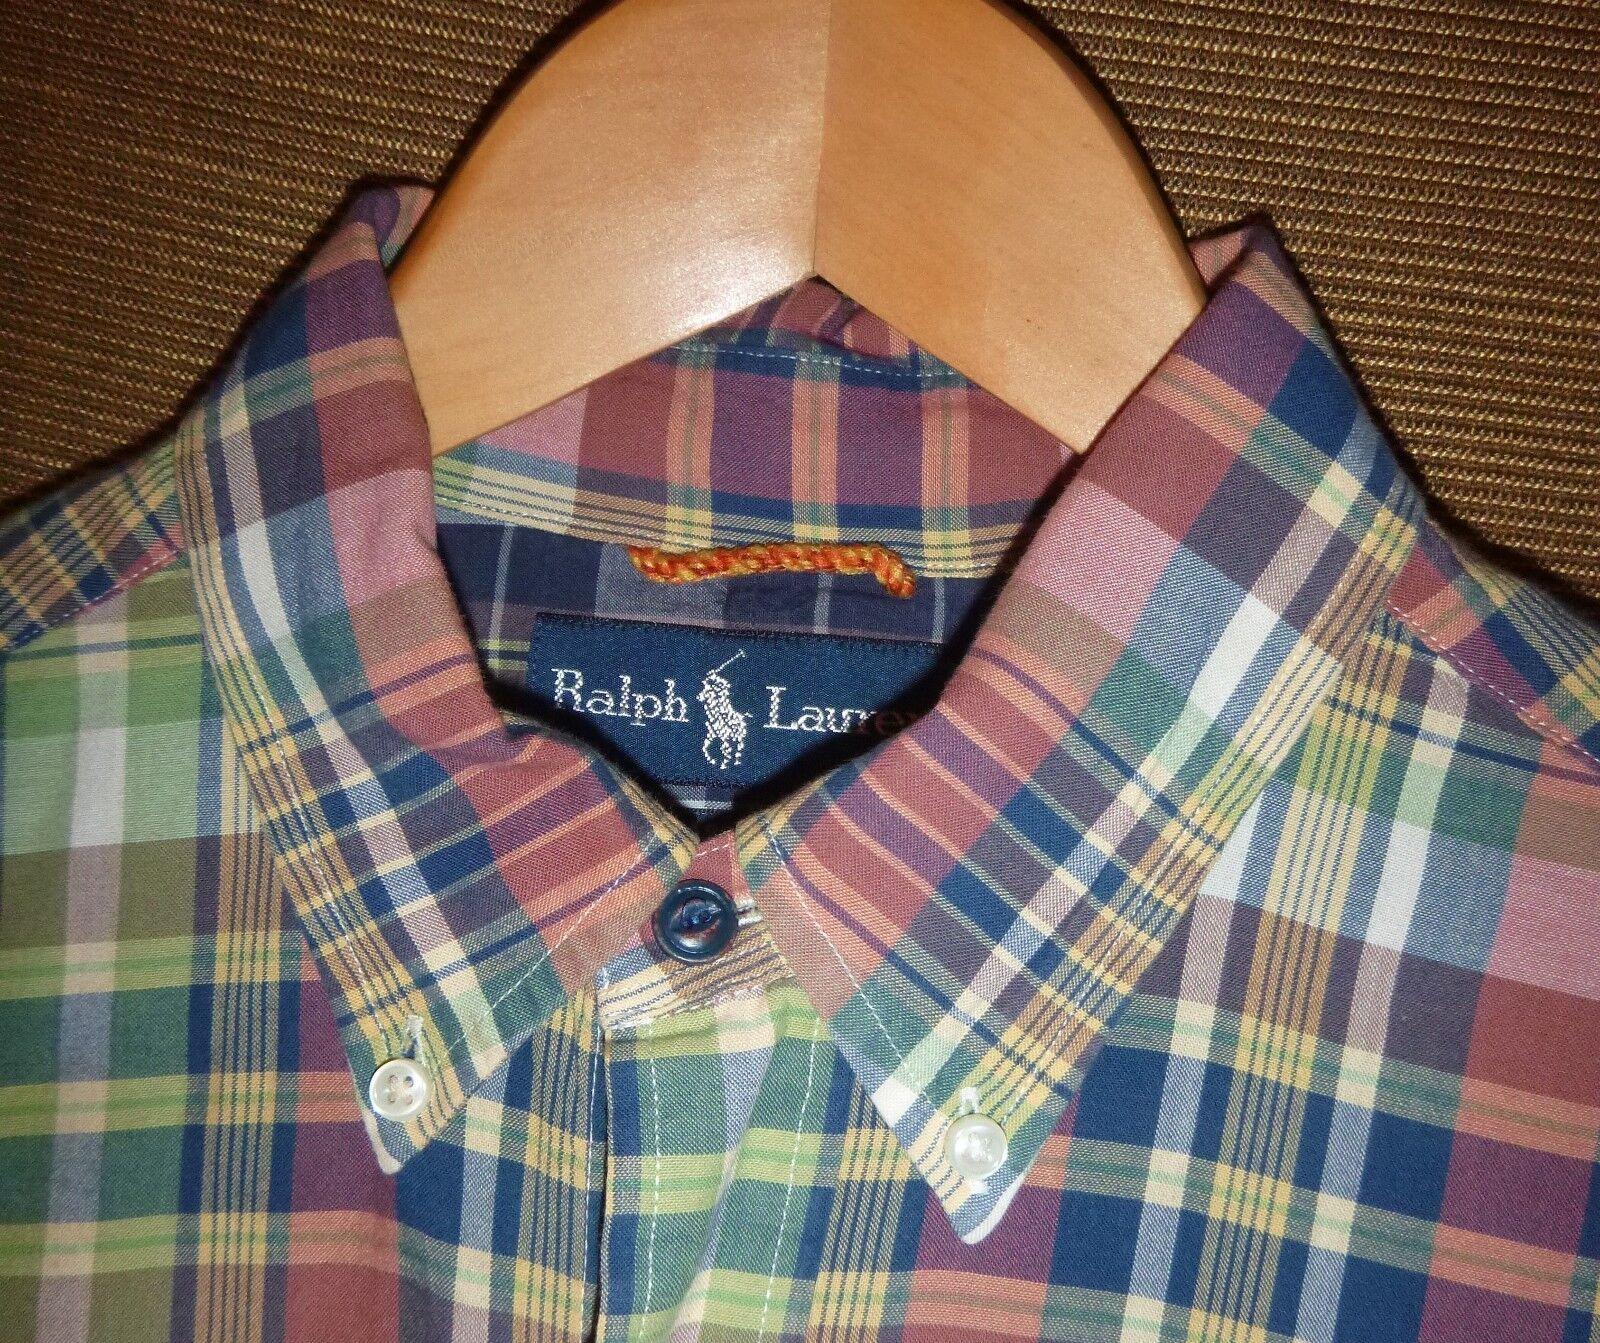 2011 Men's Polo Ralph Lauren Aberdare Edition Classic Fit Shirt size Medium